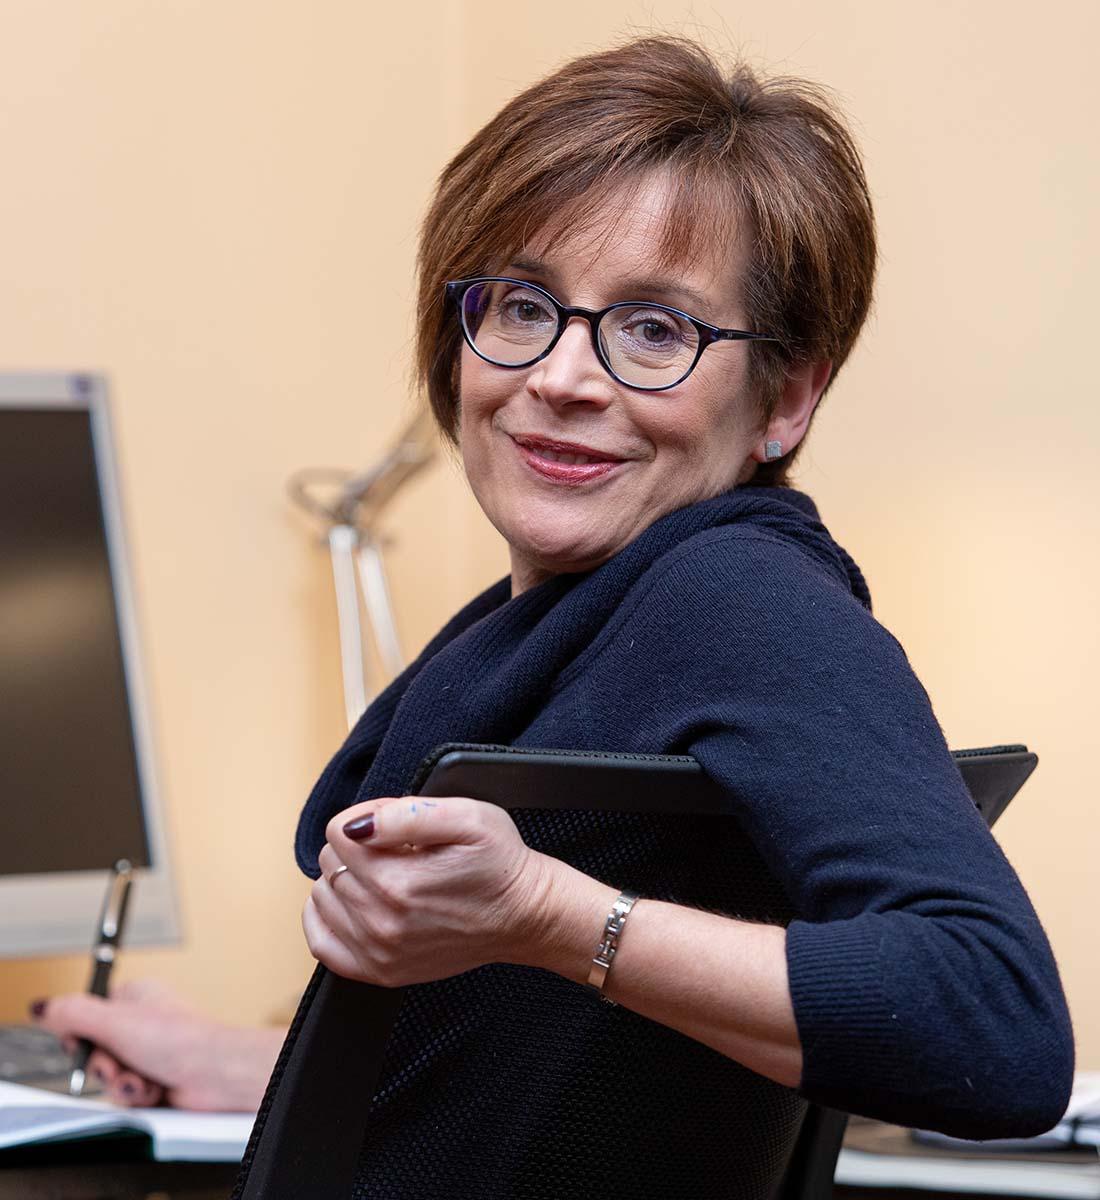 Paola Brentegani Counselor Professionista